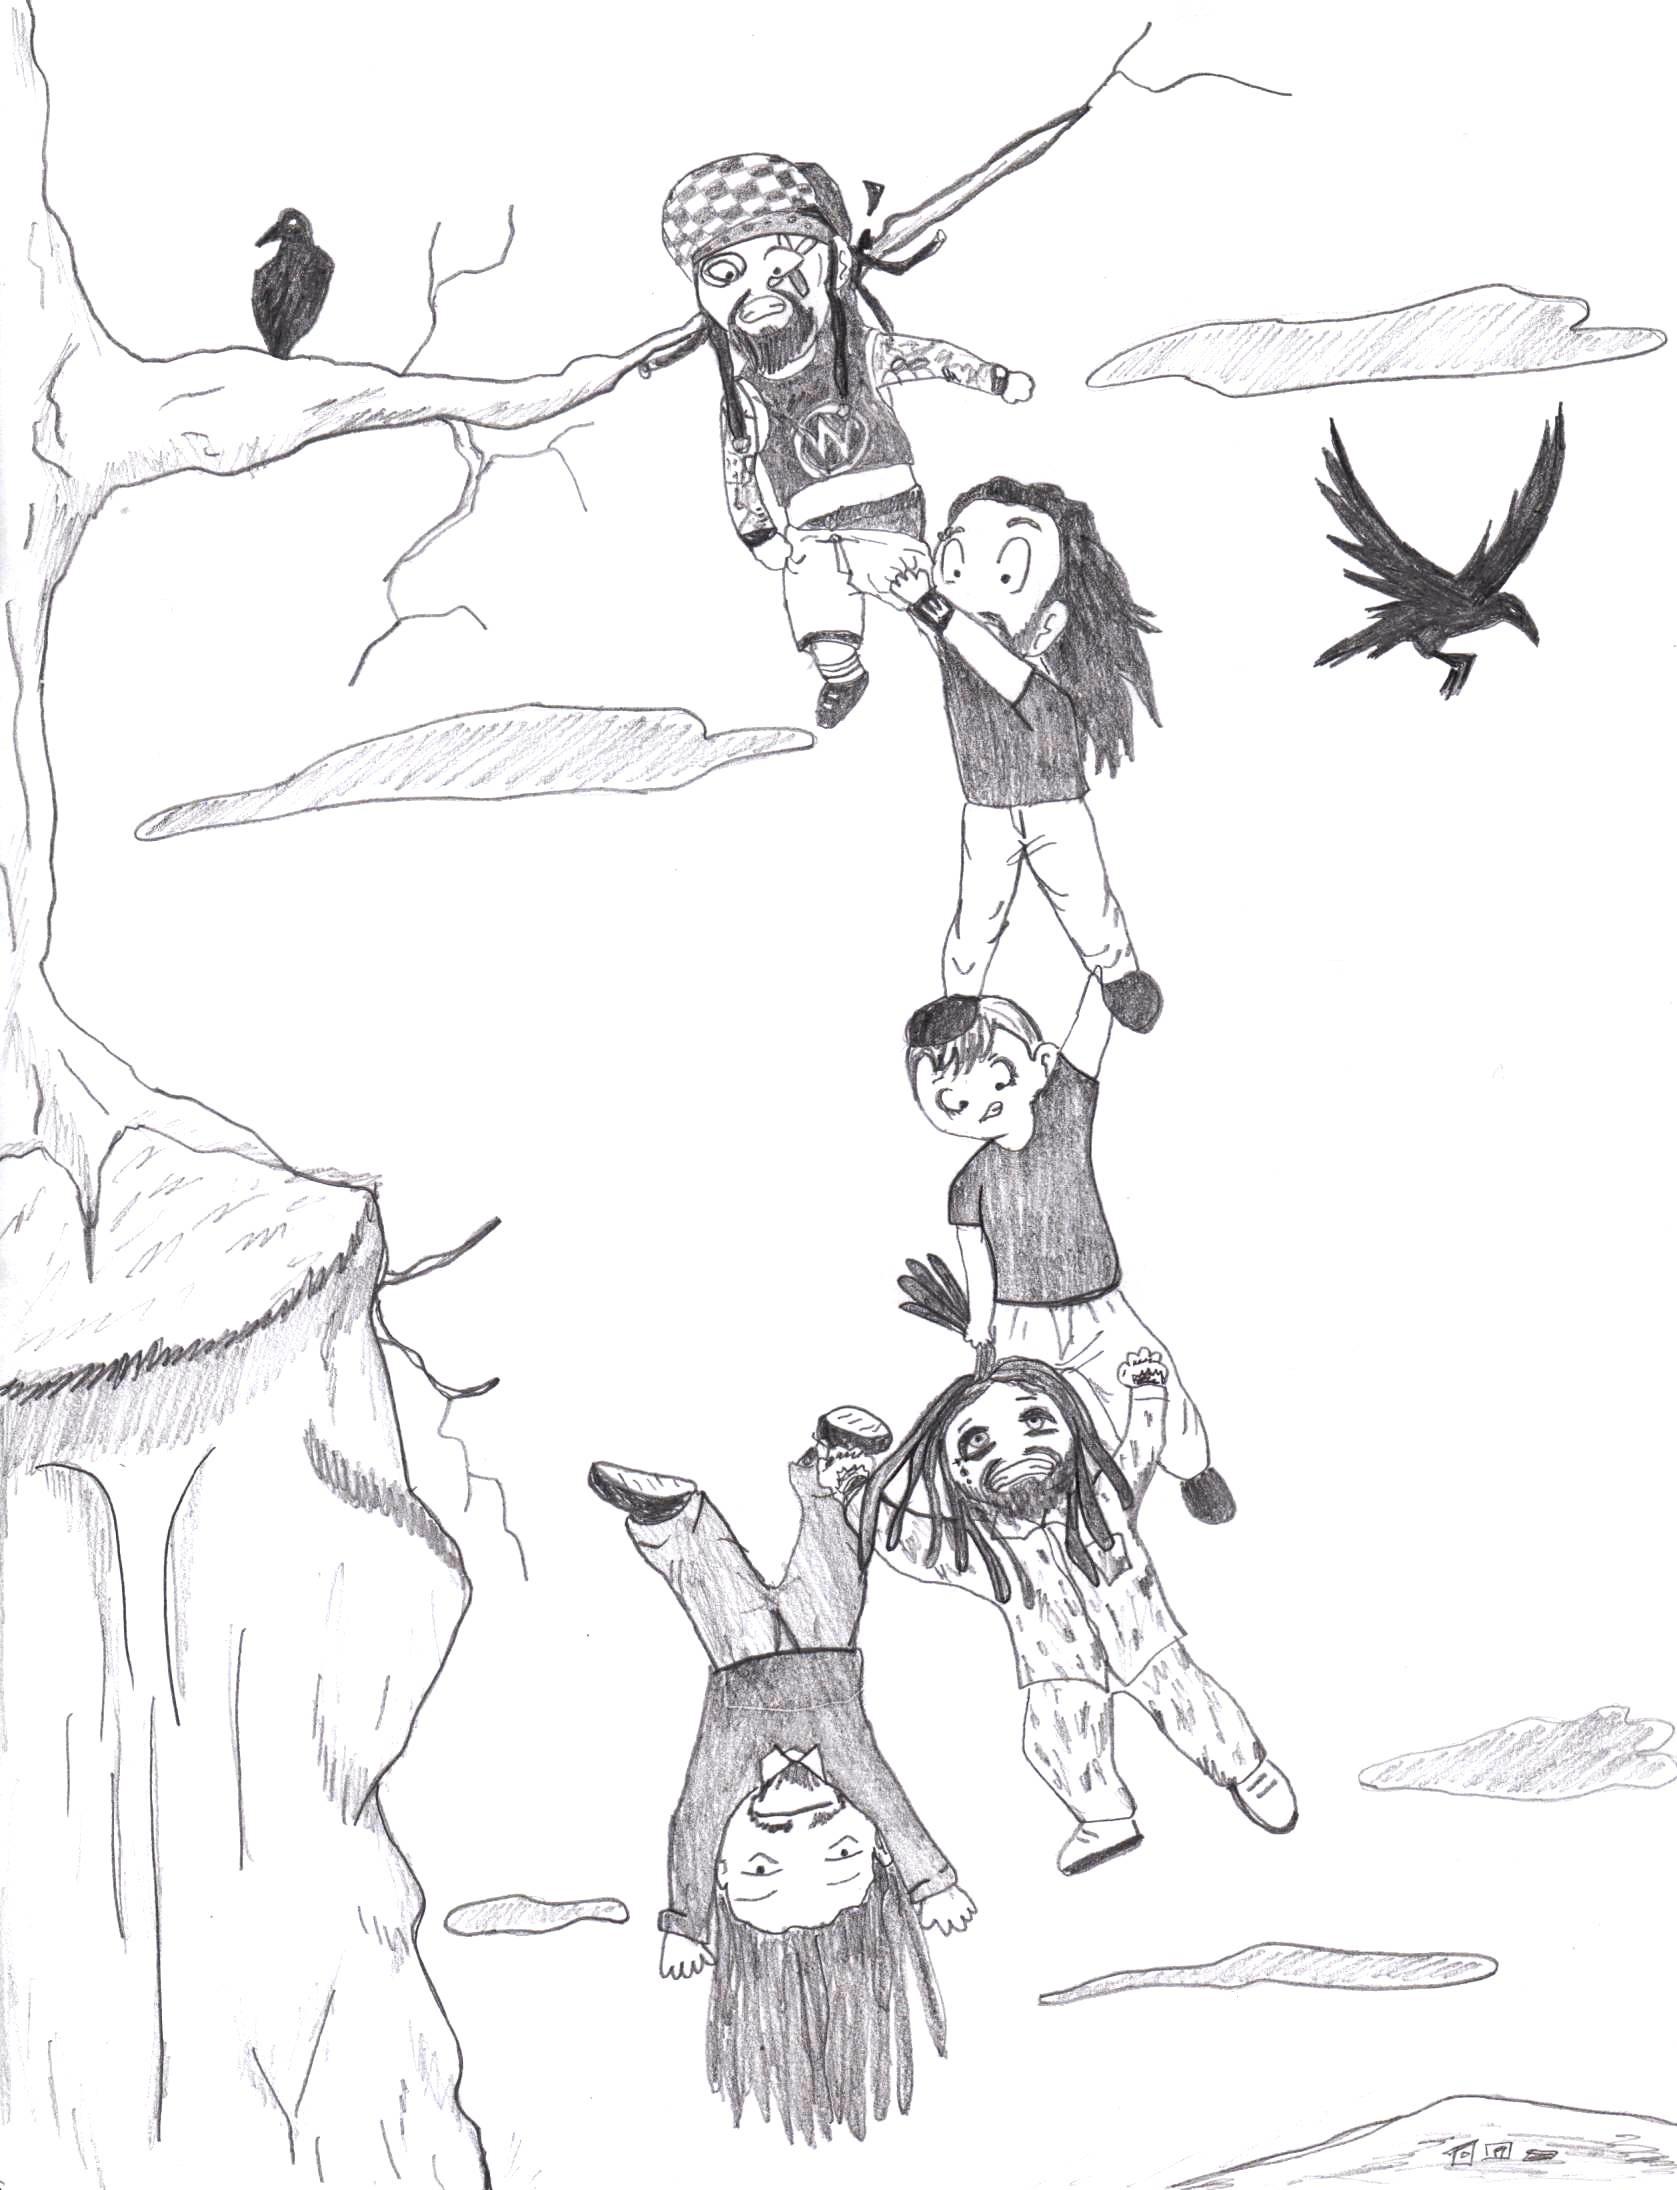 Drawn korn cute cartoon Cartoon on 2013 Cartoon DeviantArt